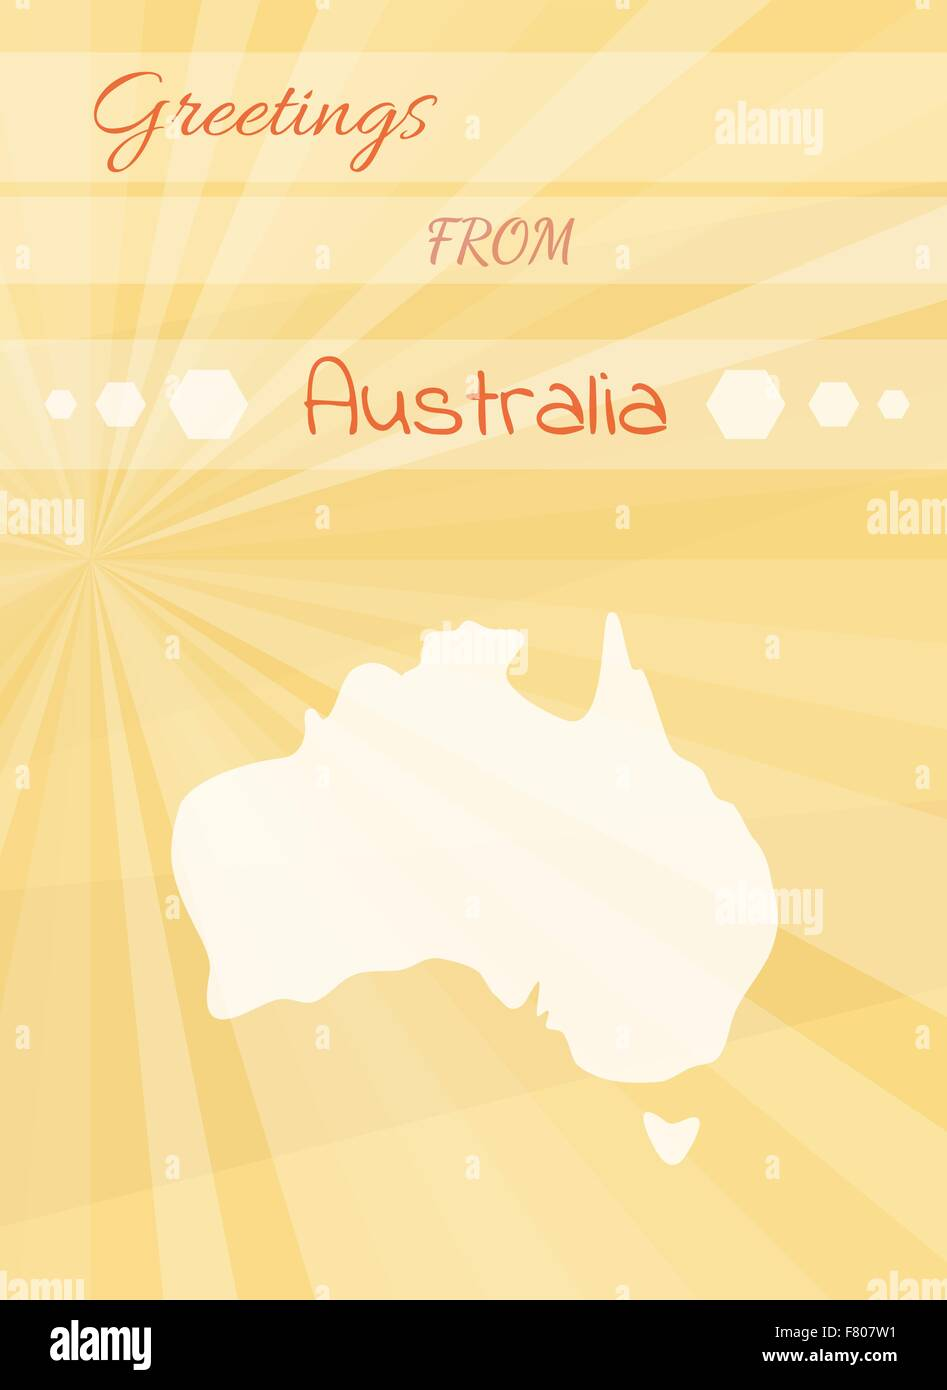 Greetings From Australia Stock Vector Art Illustration Vector